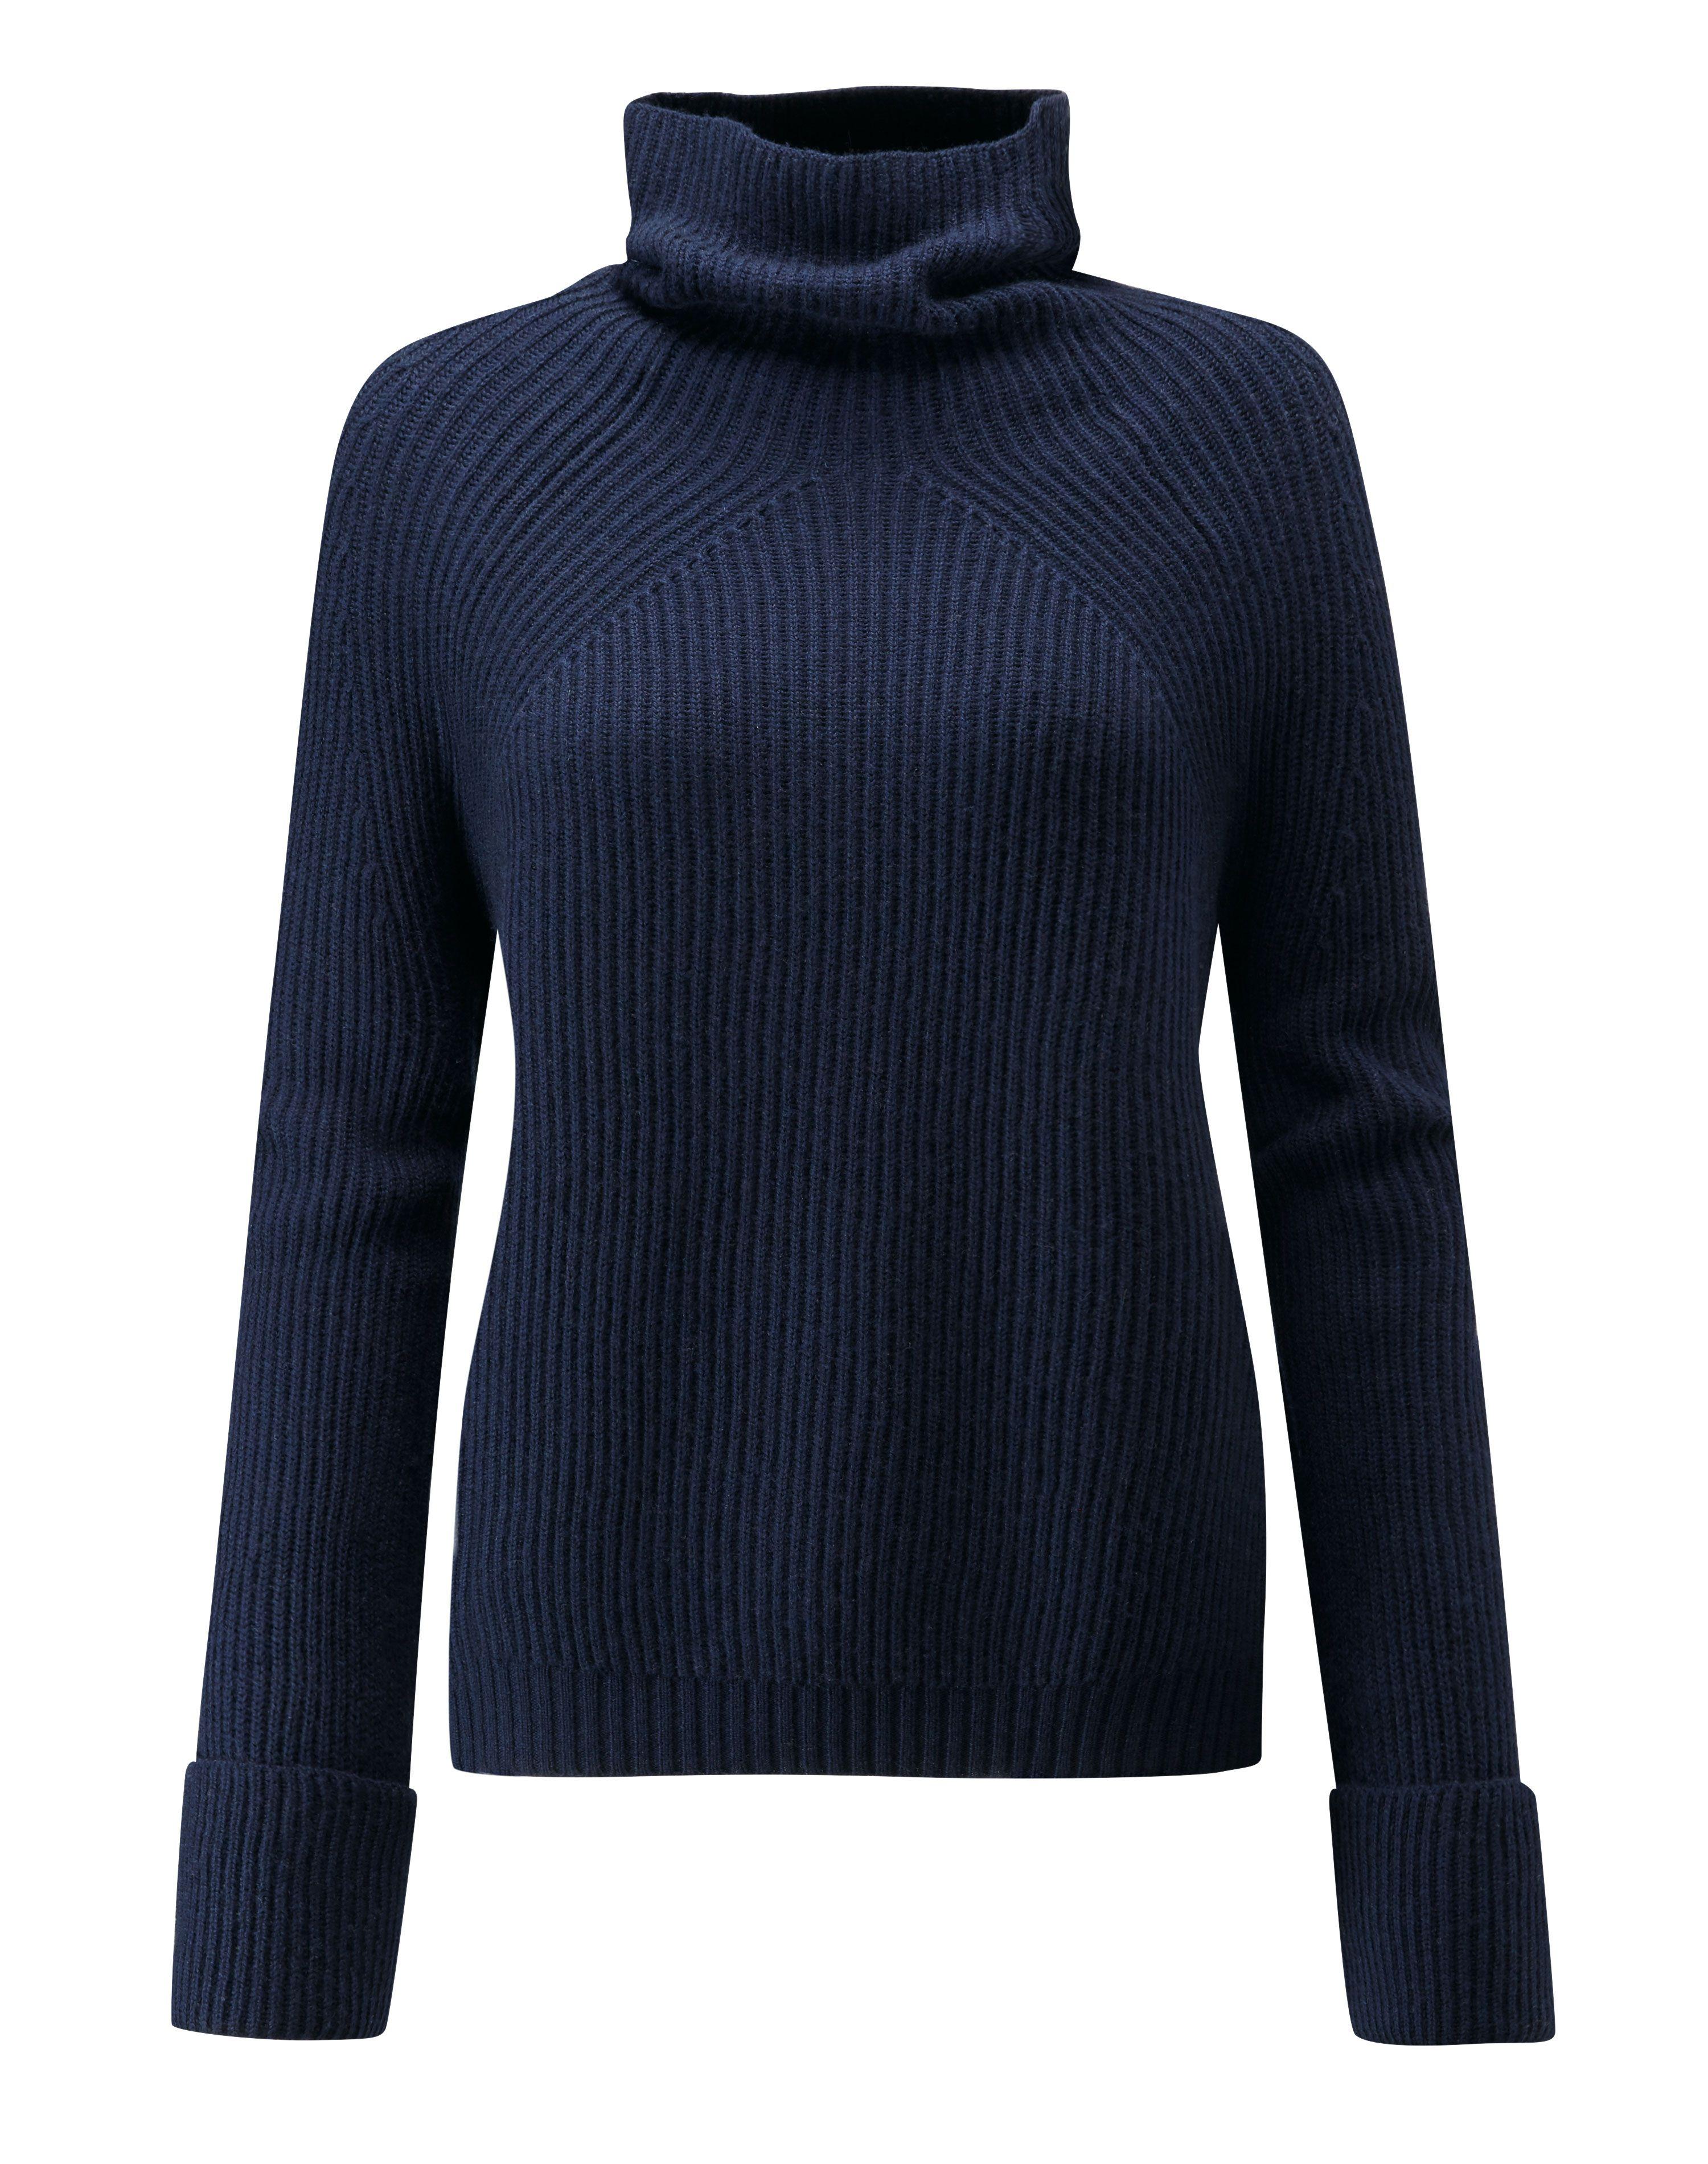 0ed108240089 Womens Rib Detail Sweater